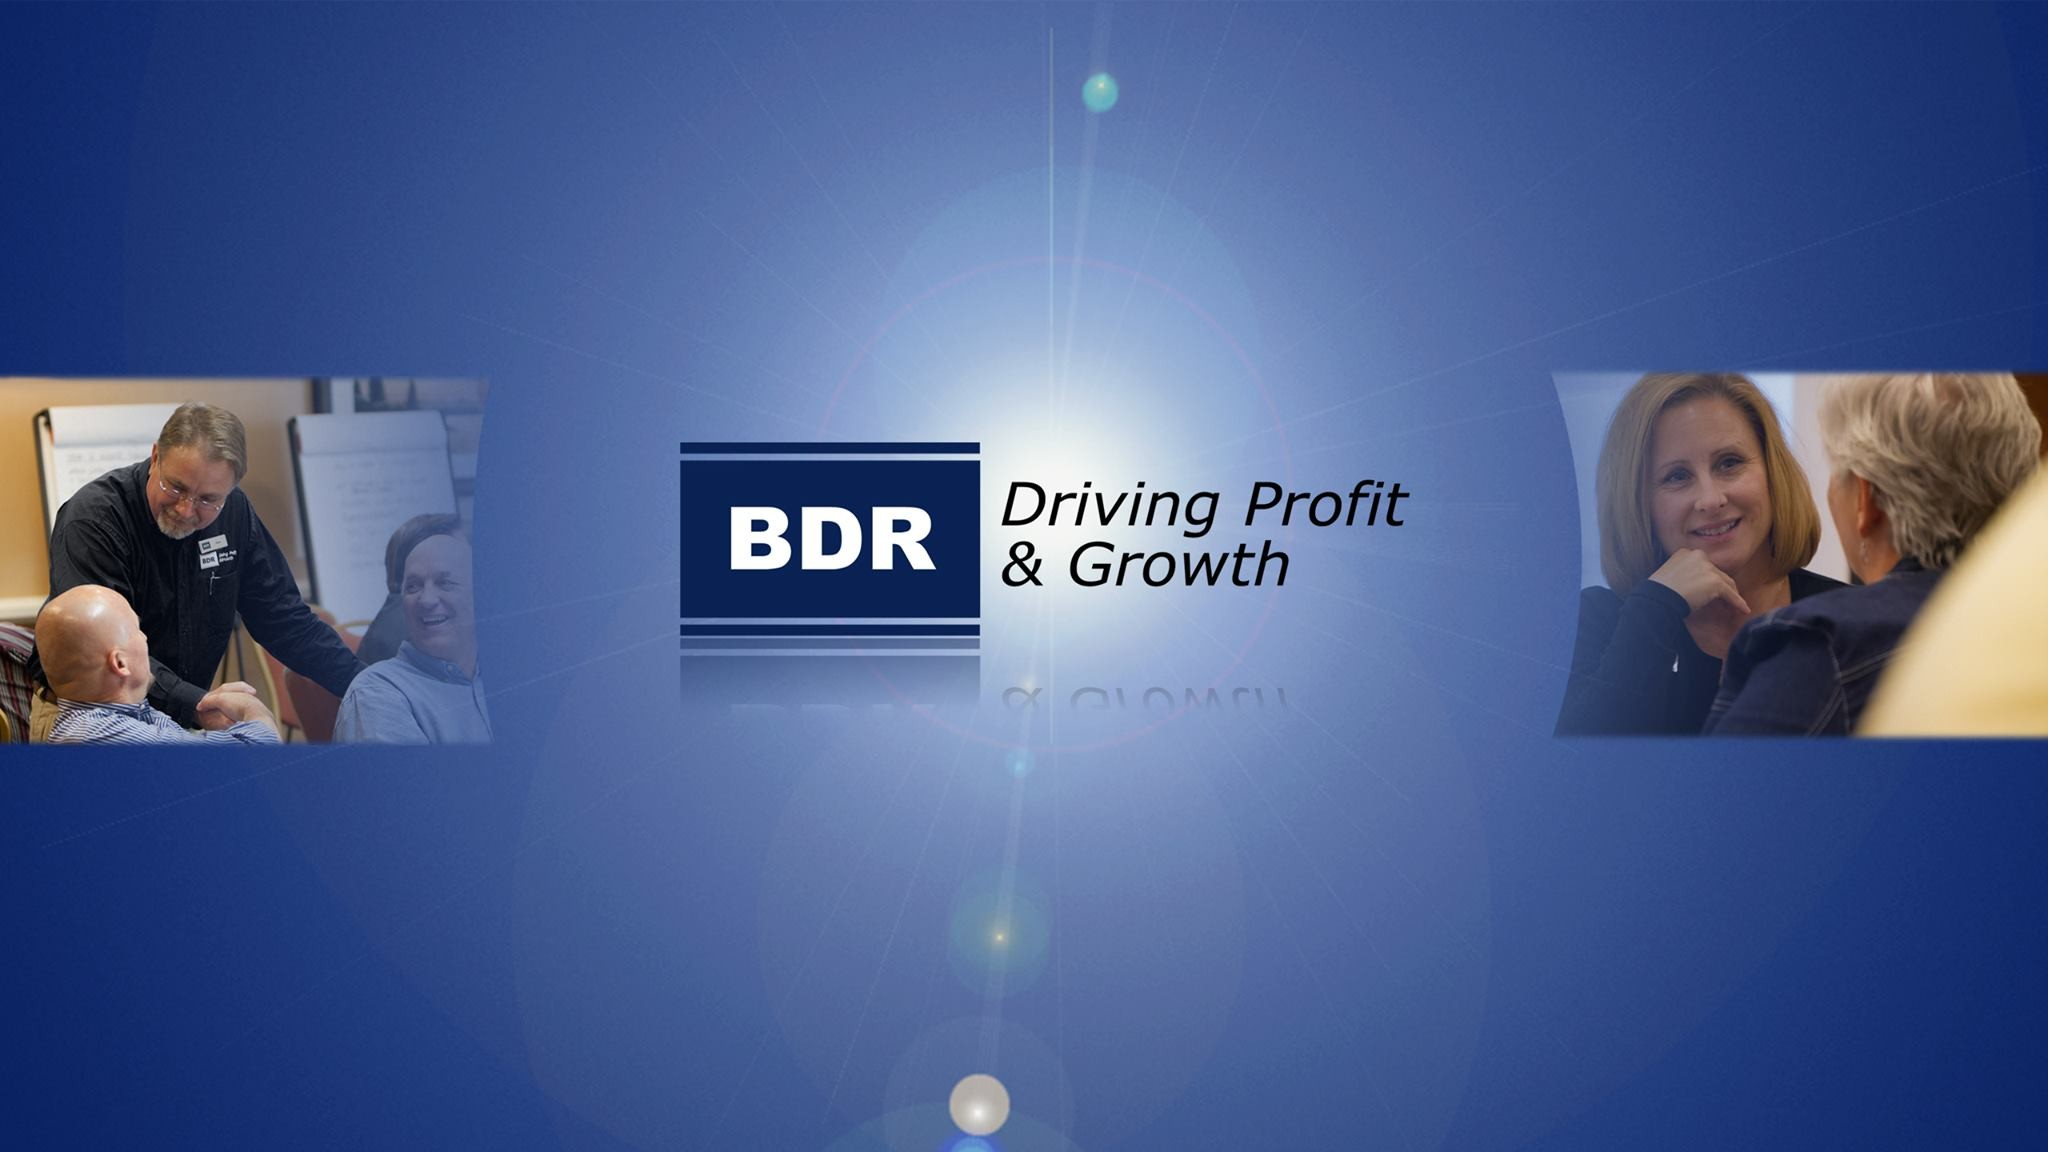 BDR - Business Development Resources | LinkedIn